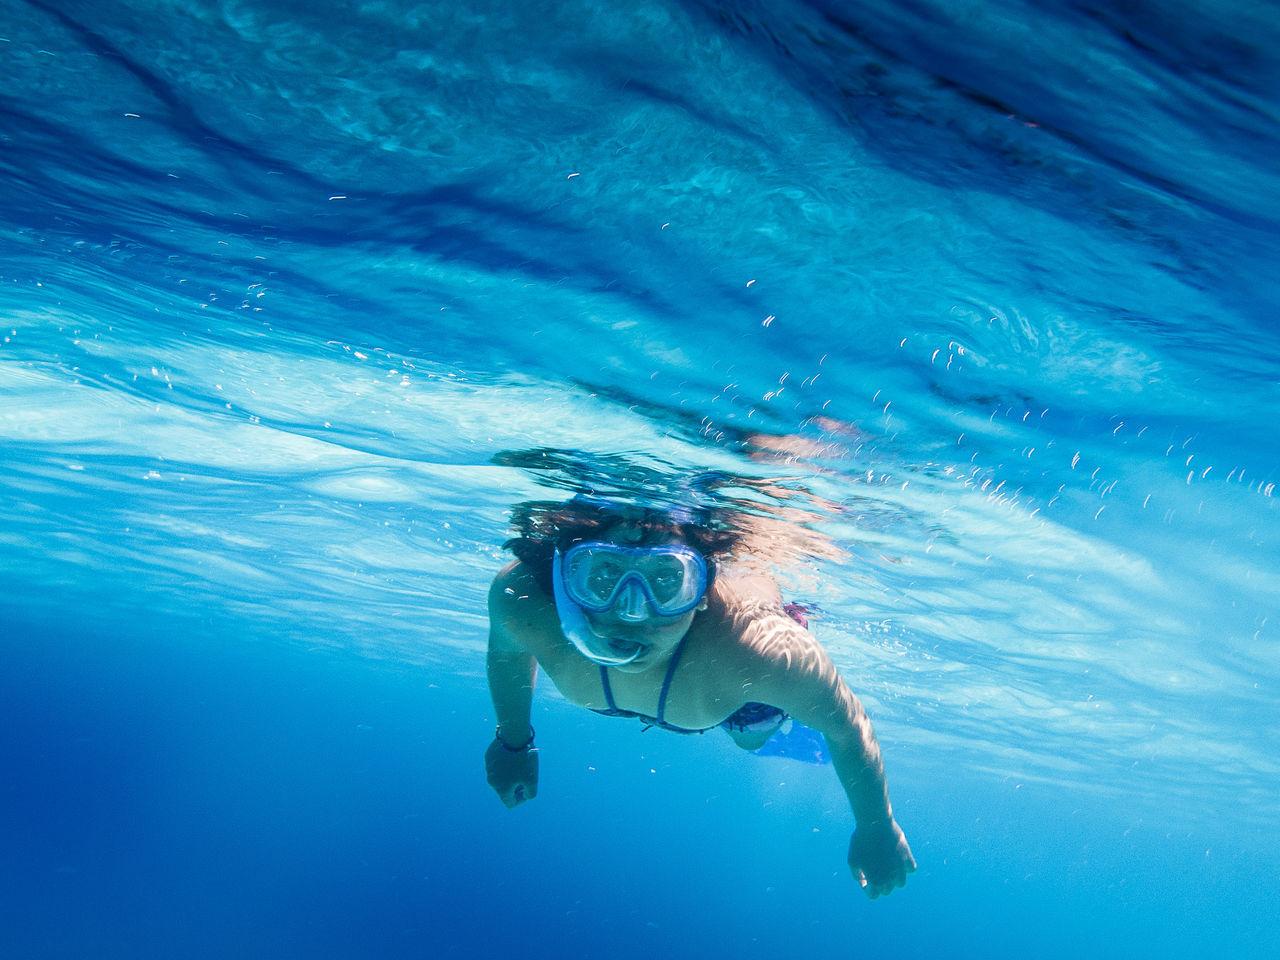 Snorkeling at Menorca